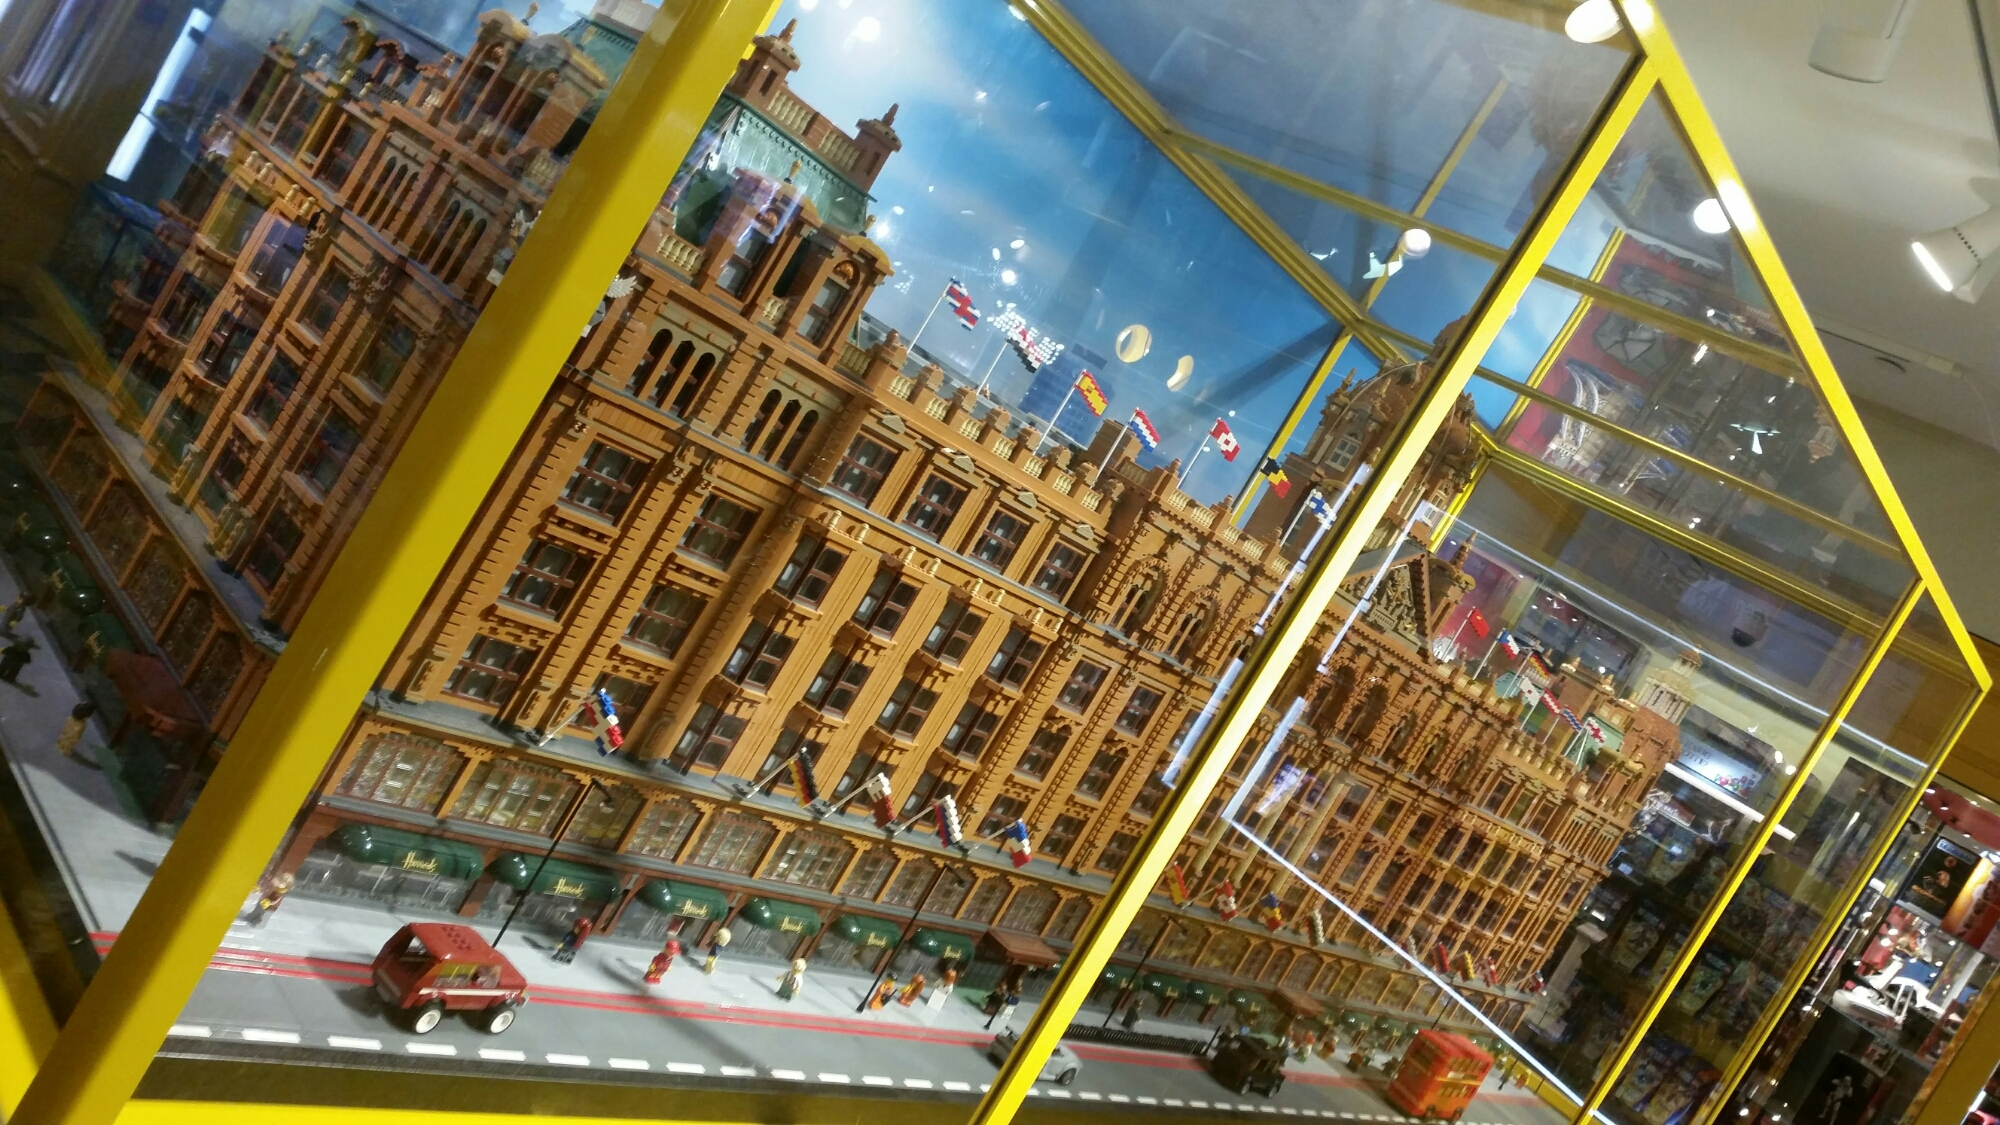 Harrods Toy Department, London